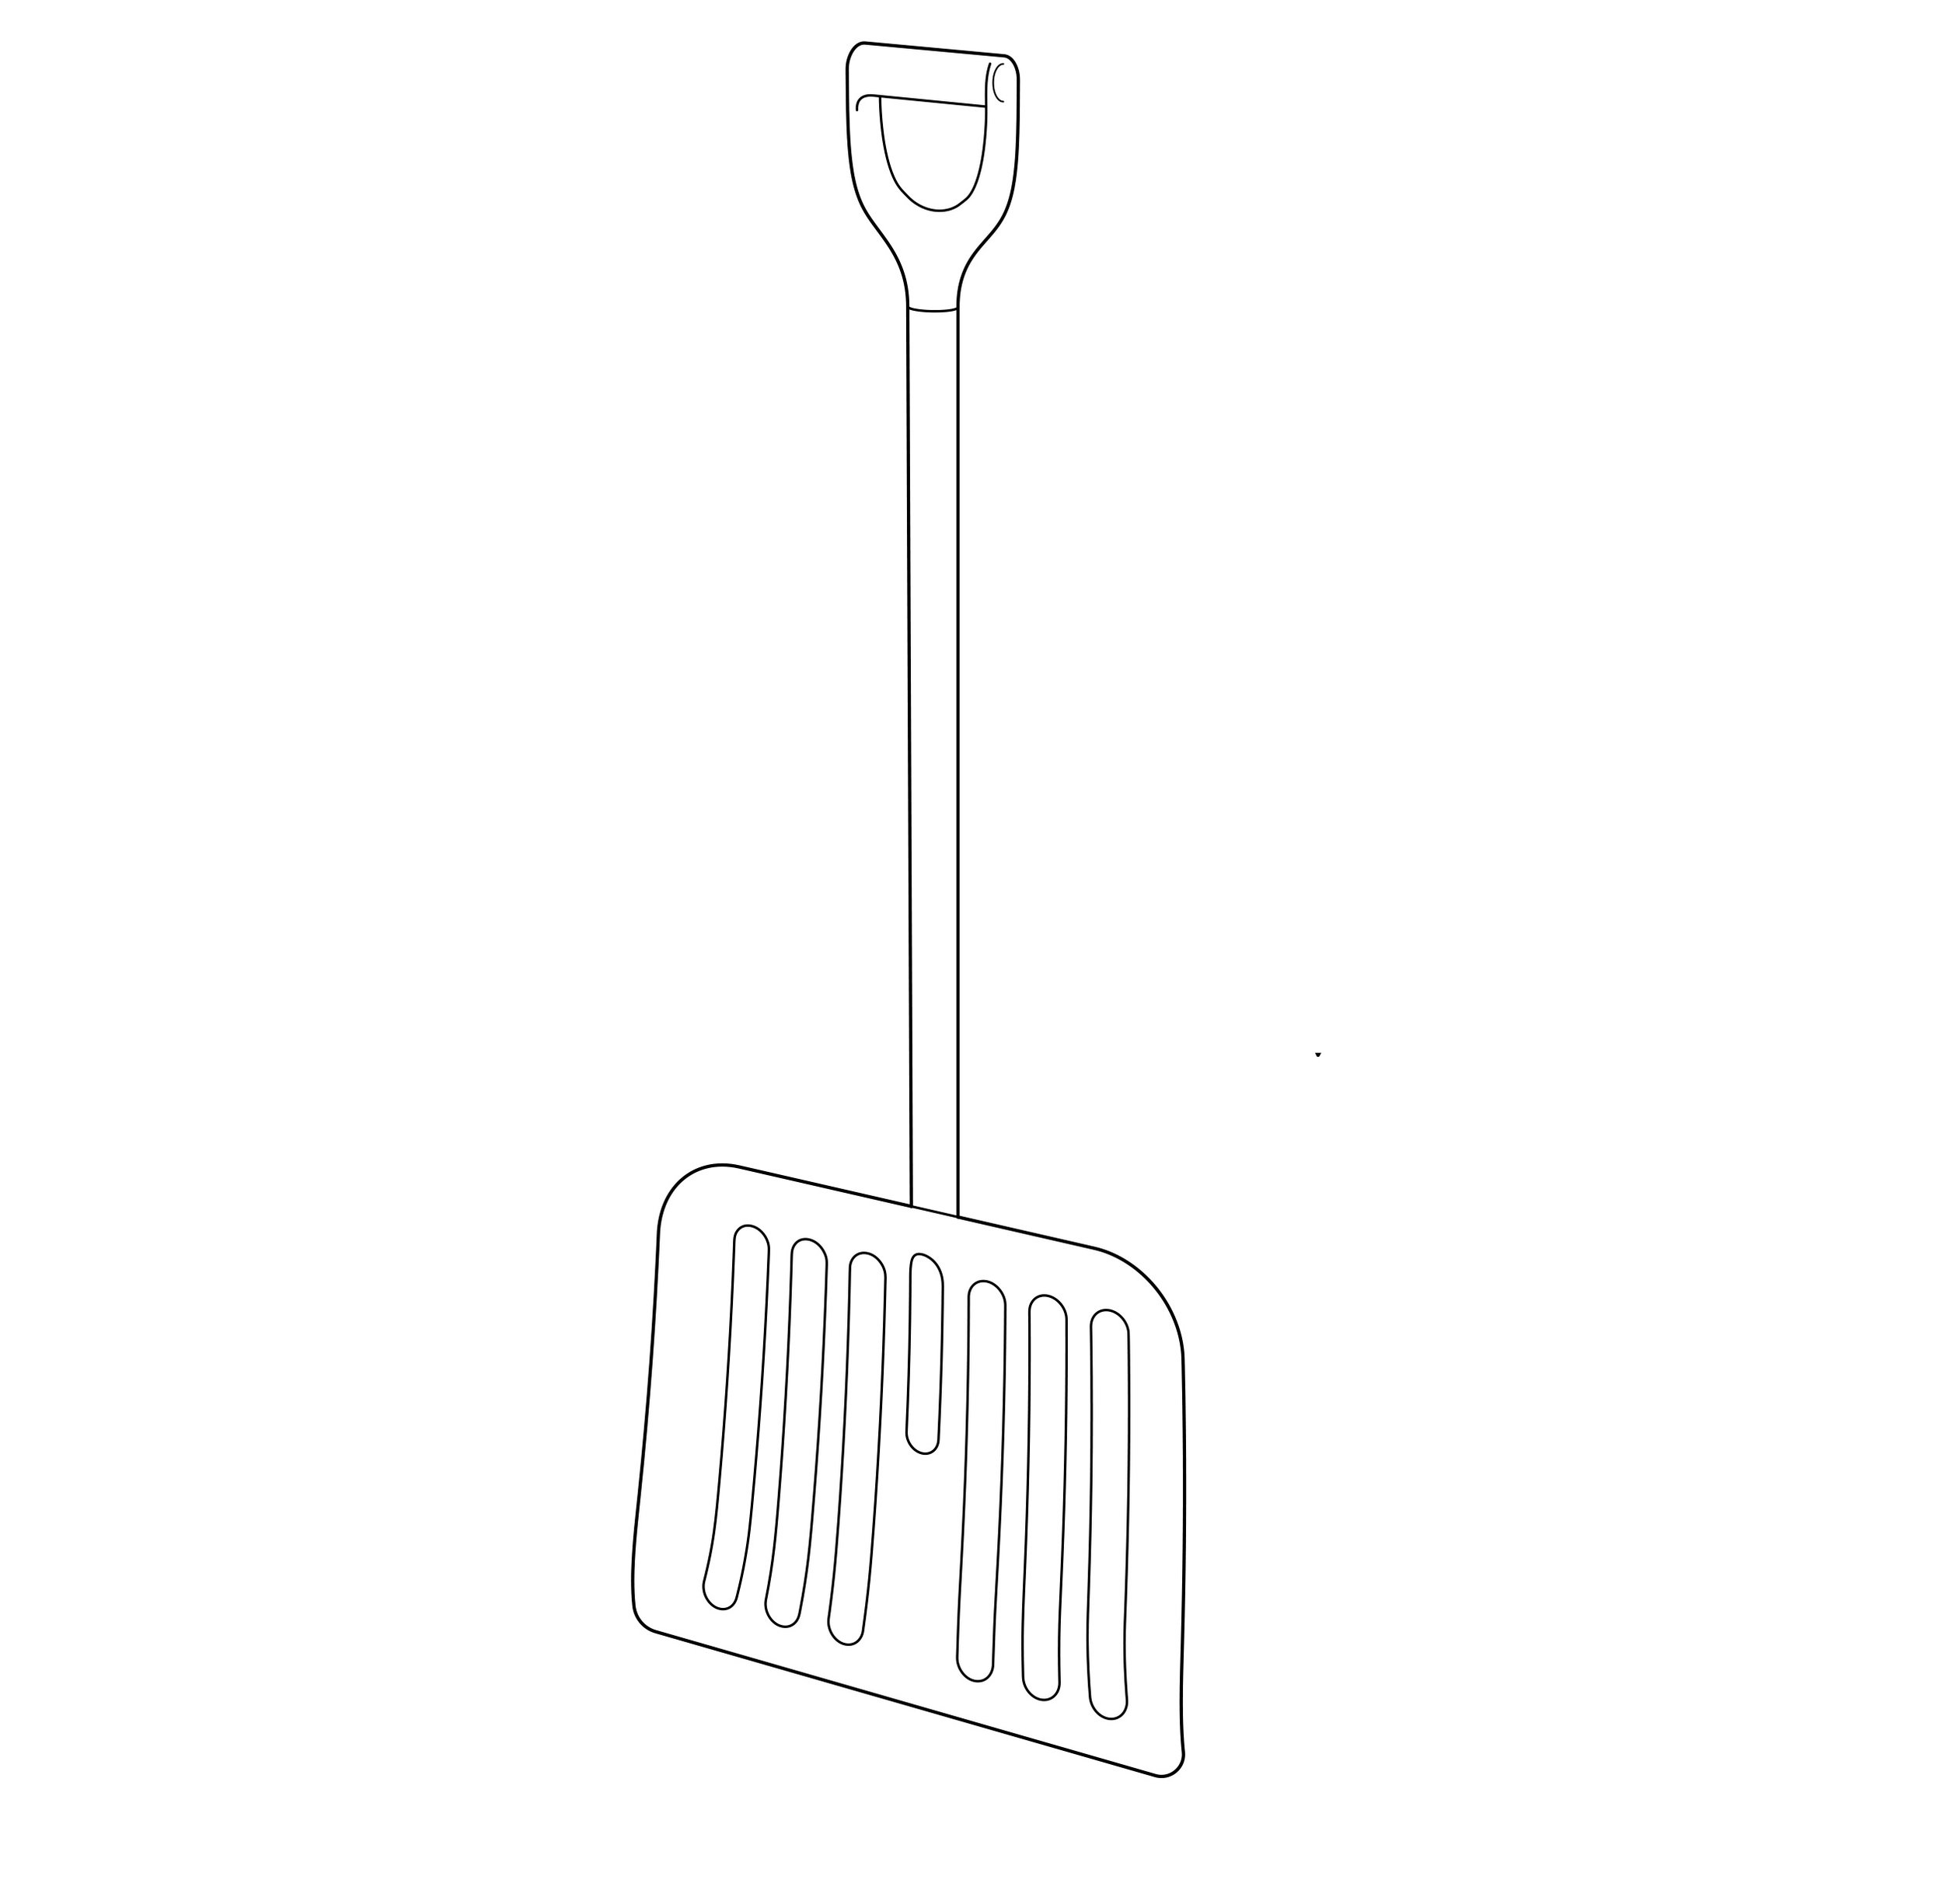 specce_chore_drawings.jpg